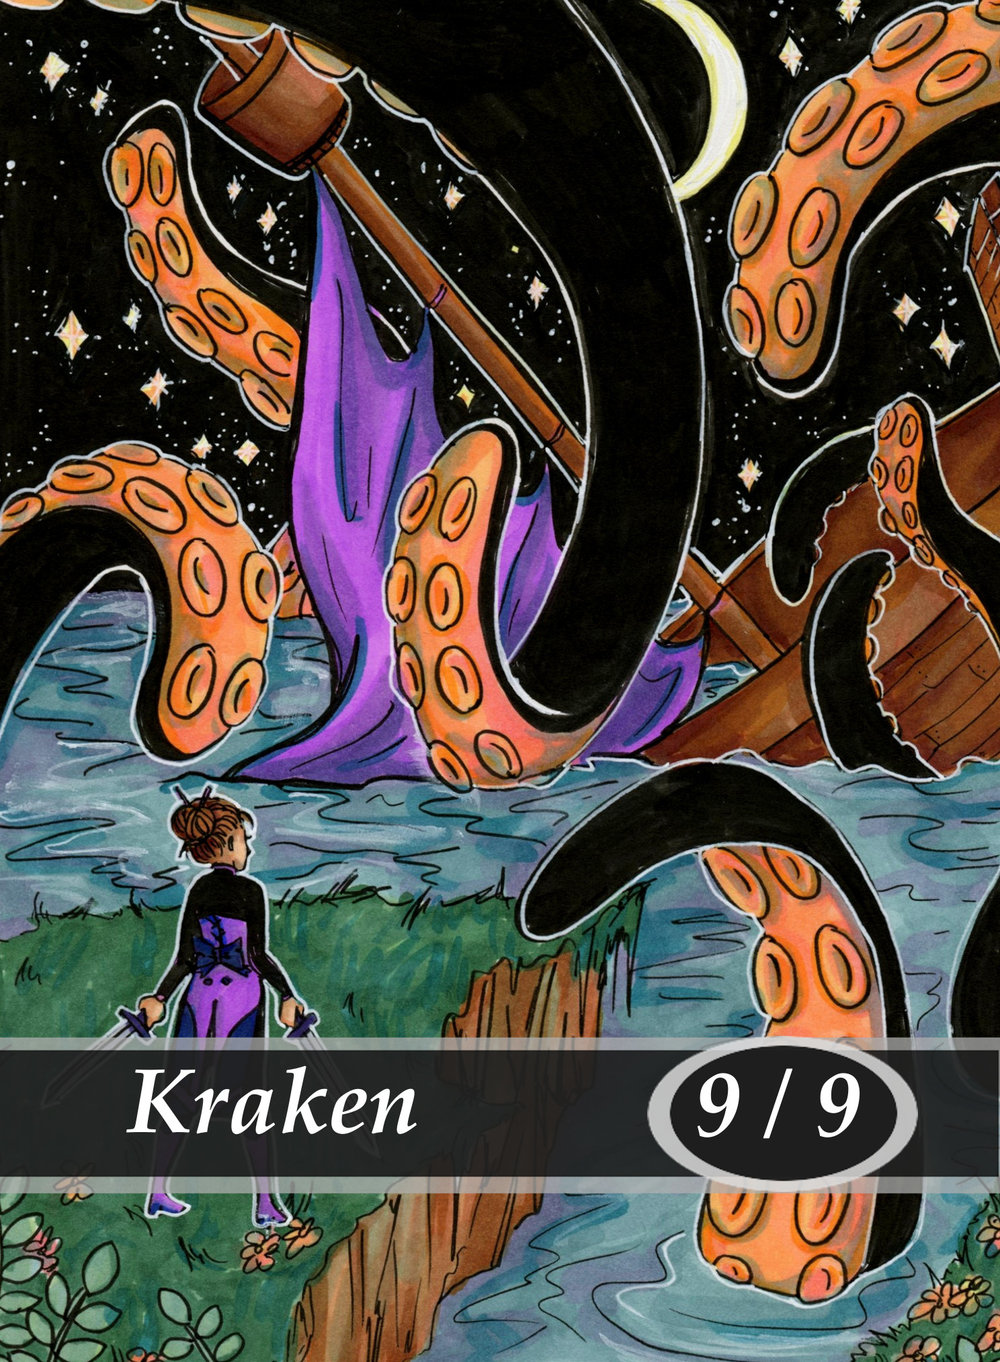 Kraken Magic the Gathering MTG Token by Anna Van Skike with AnnaVSart